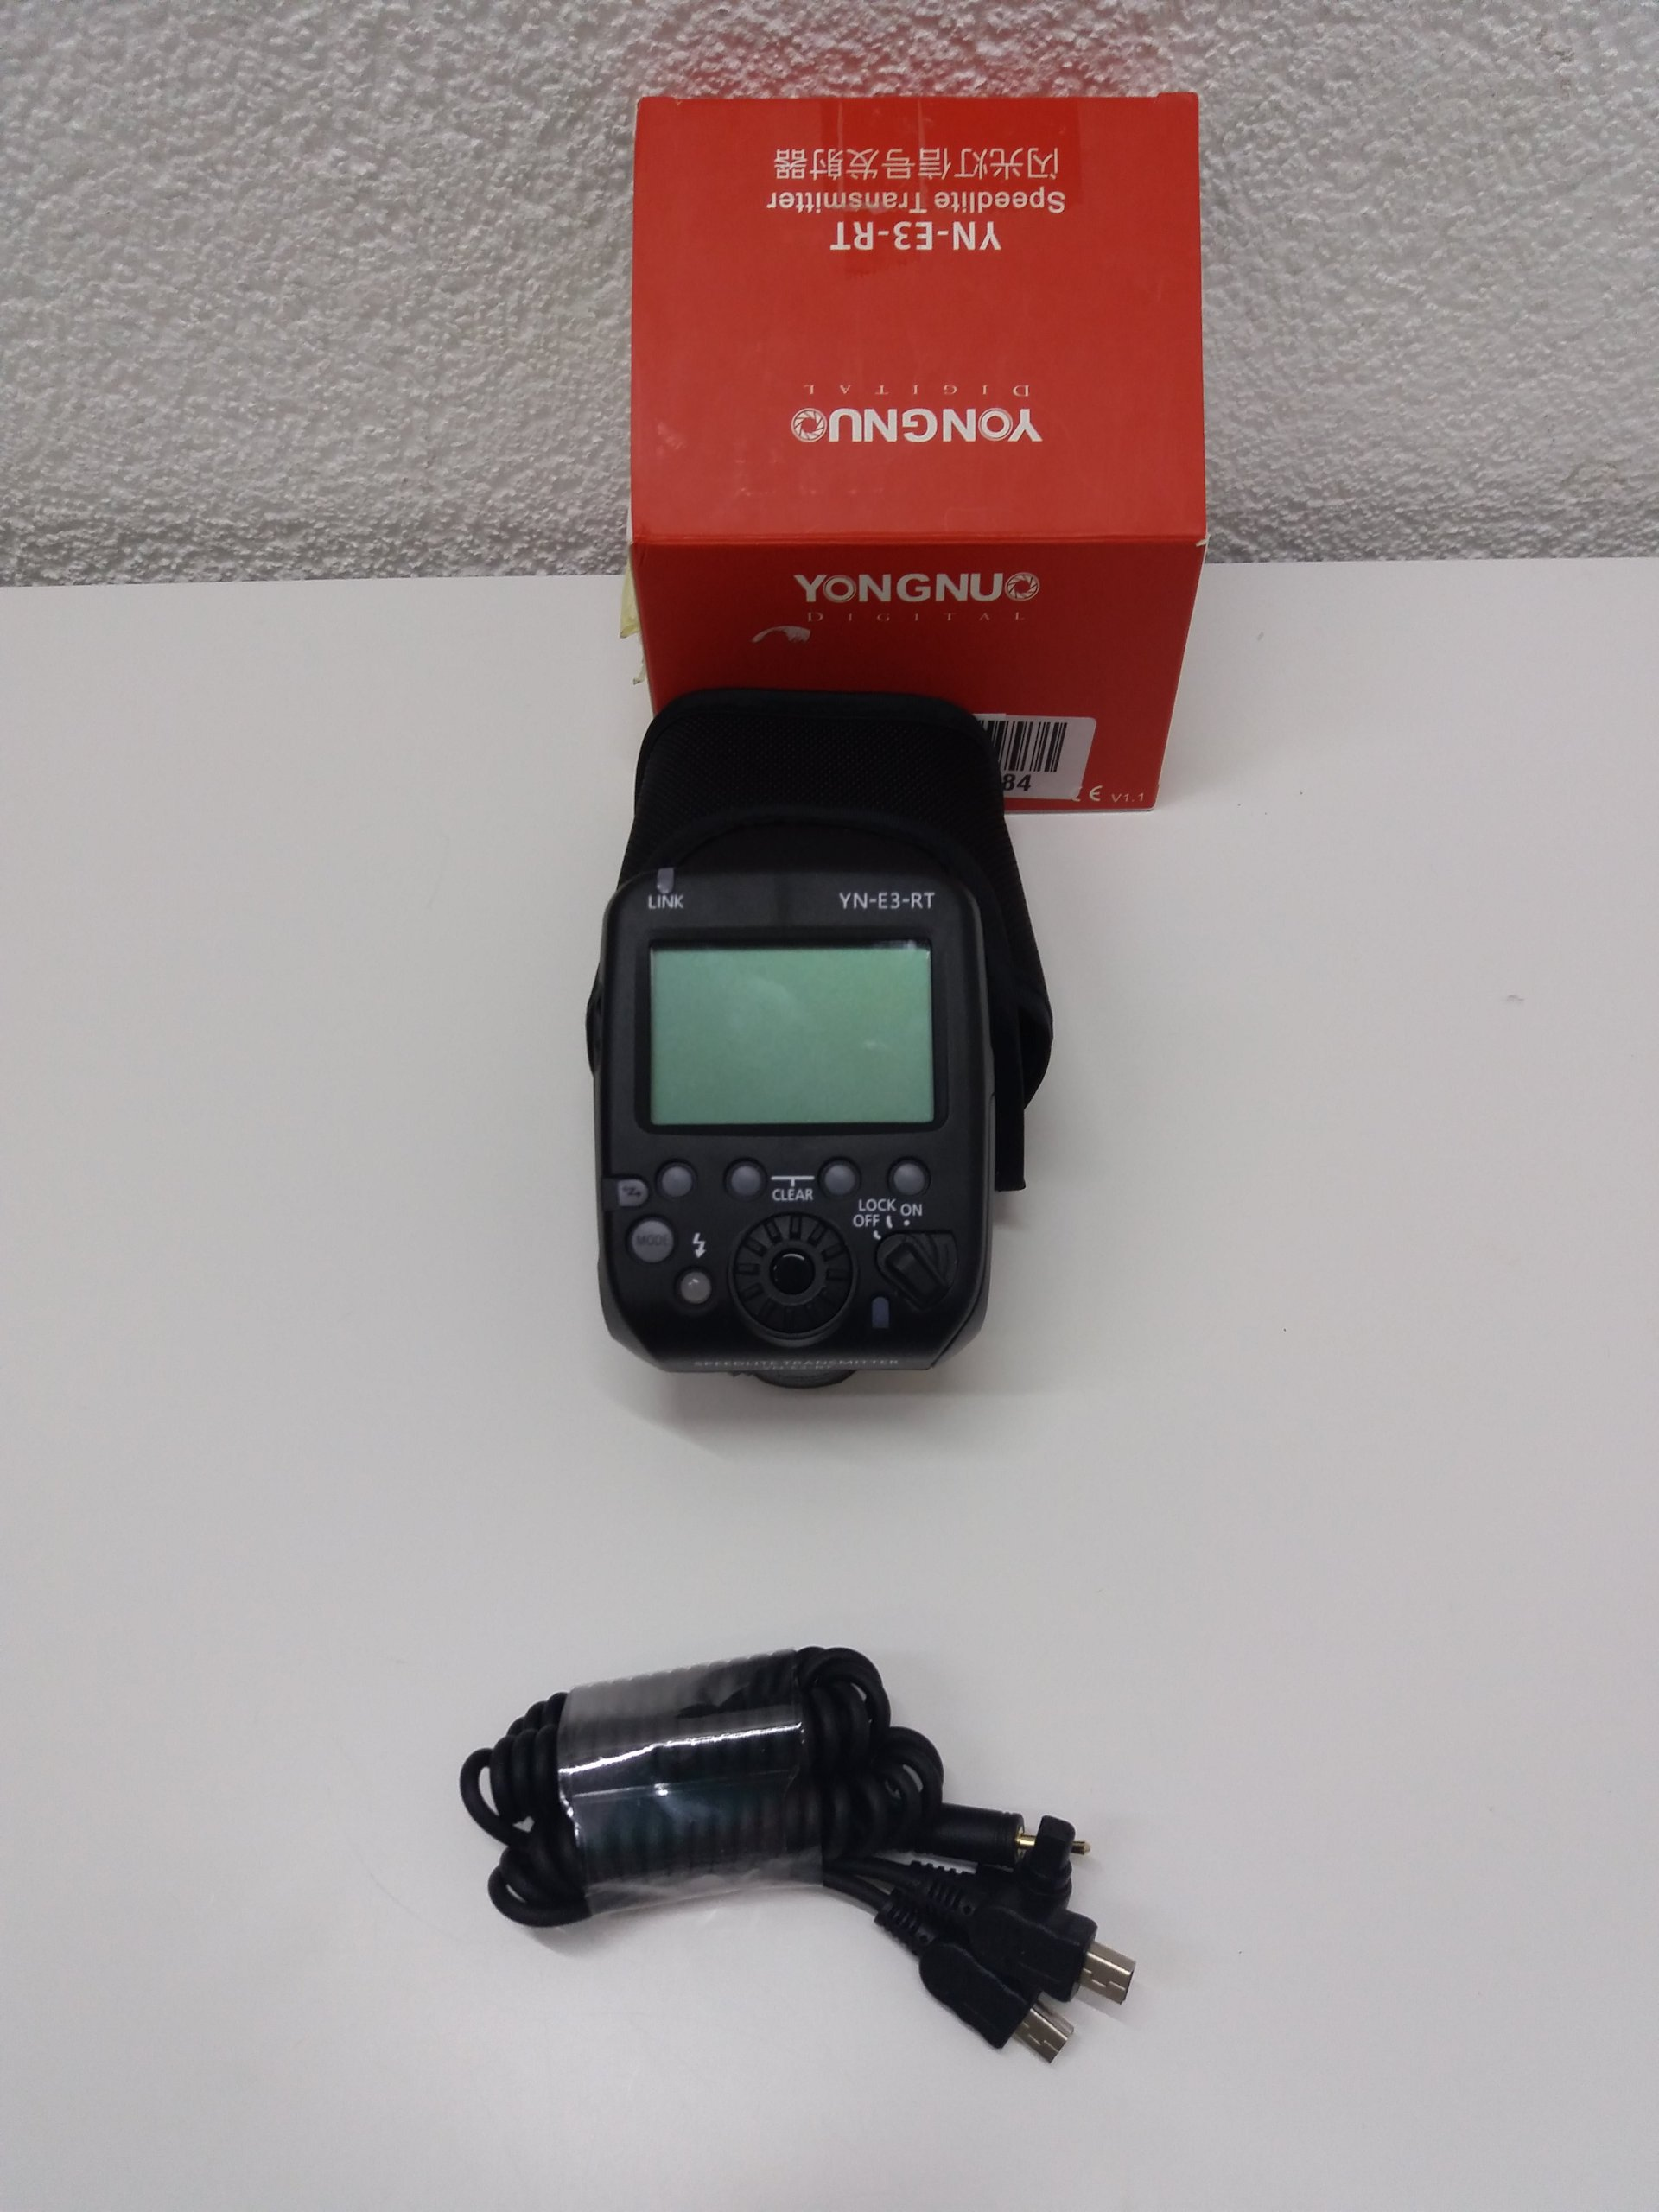 C8 Yongnuo YN-E3-RT kontroler radiowy stopka Canon